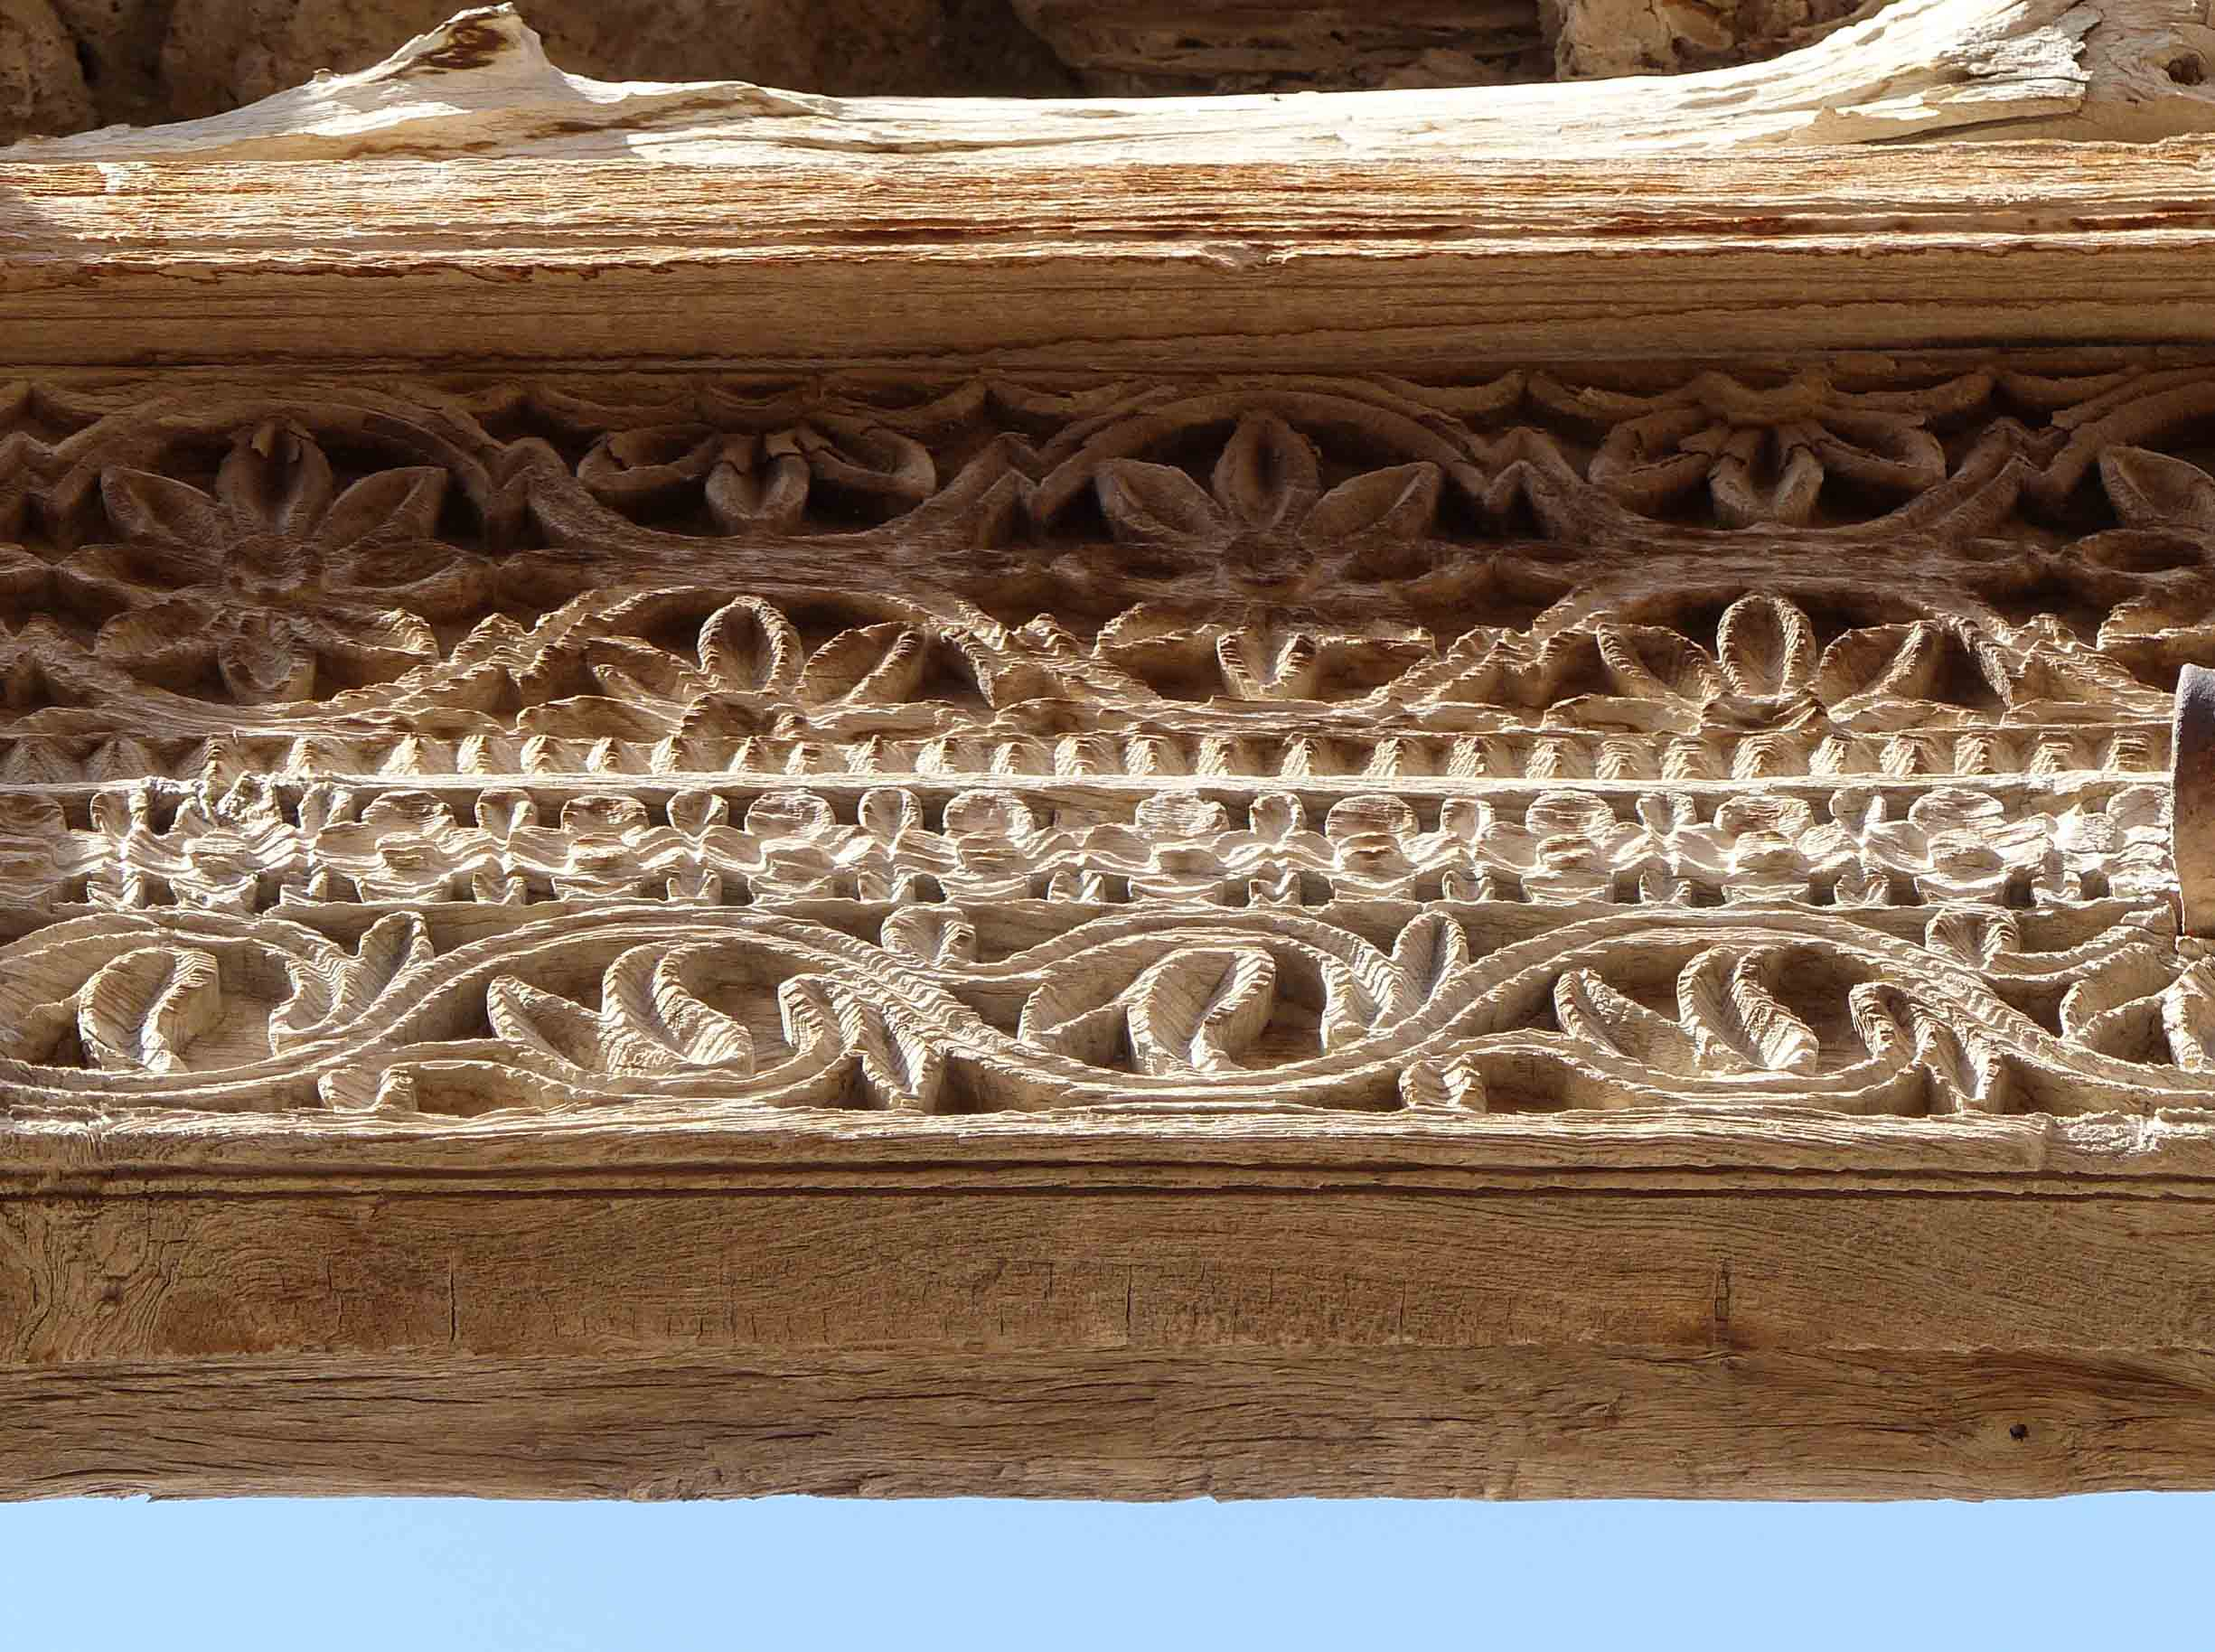 Horizontal carved wood beam